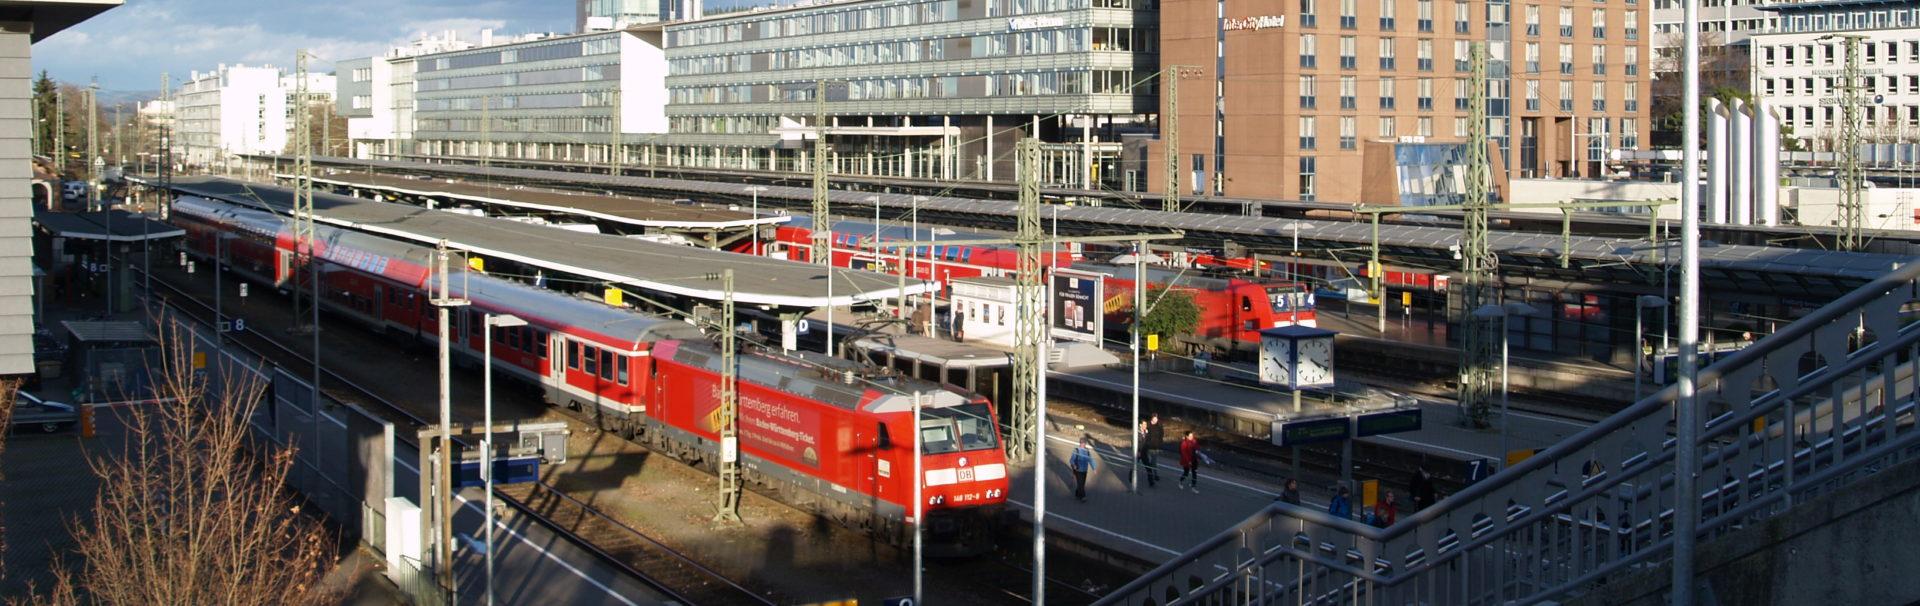 Bahnhof Freiburg (Breisgau) Hbf